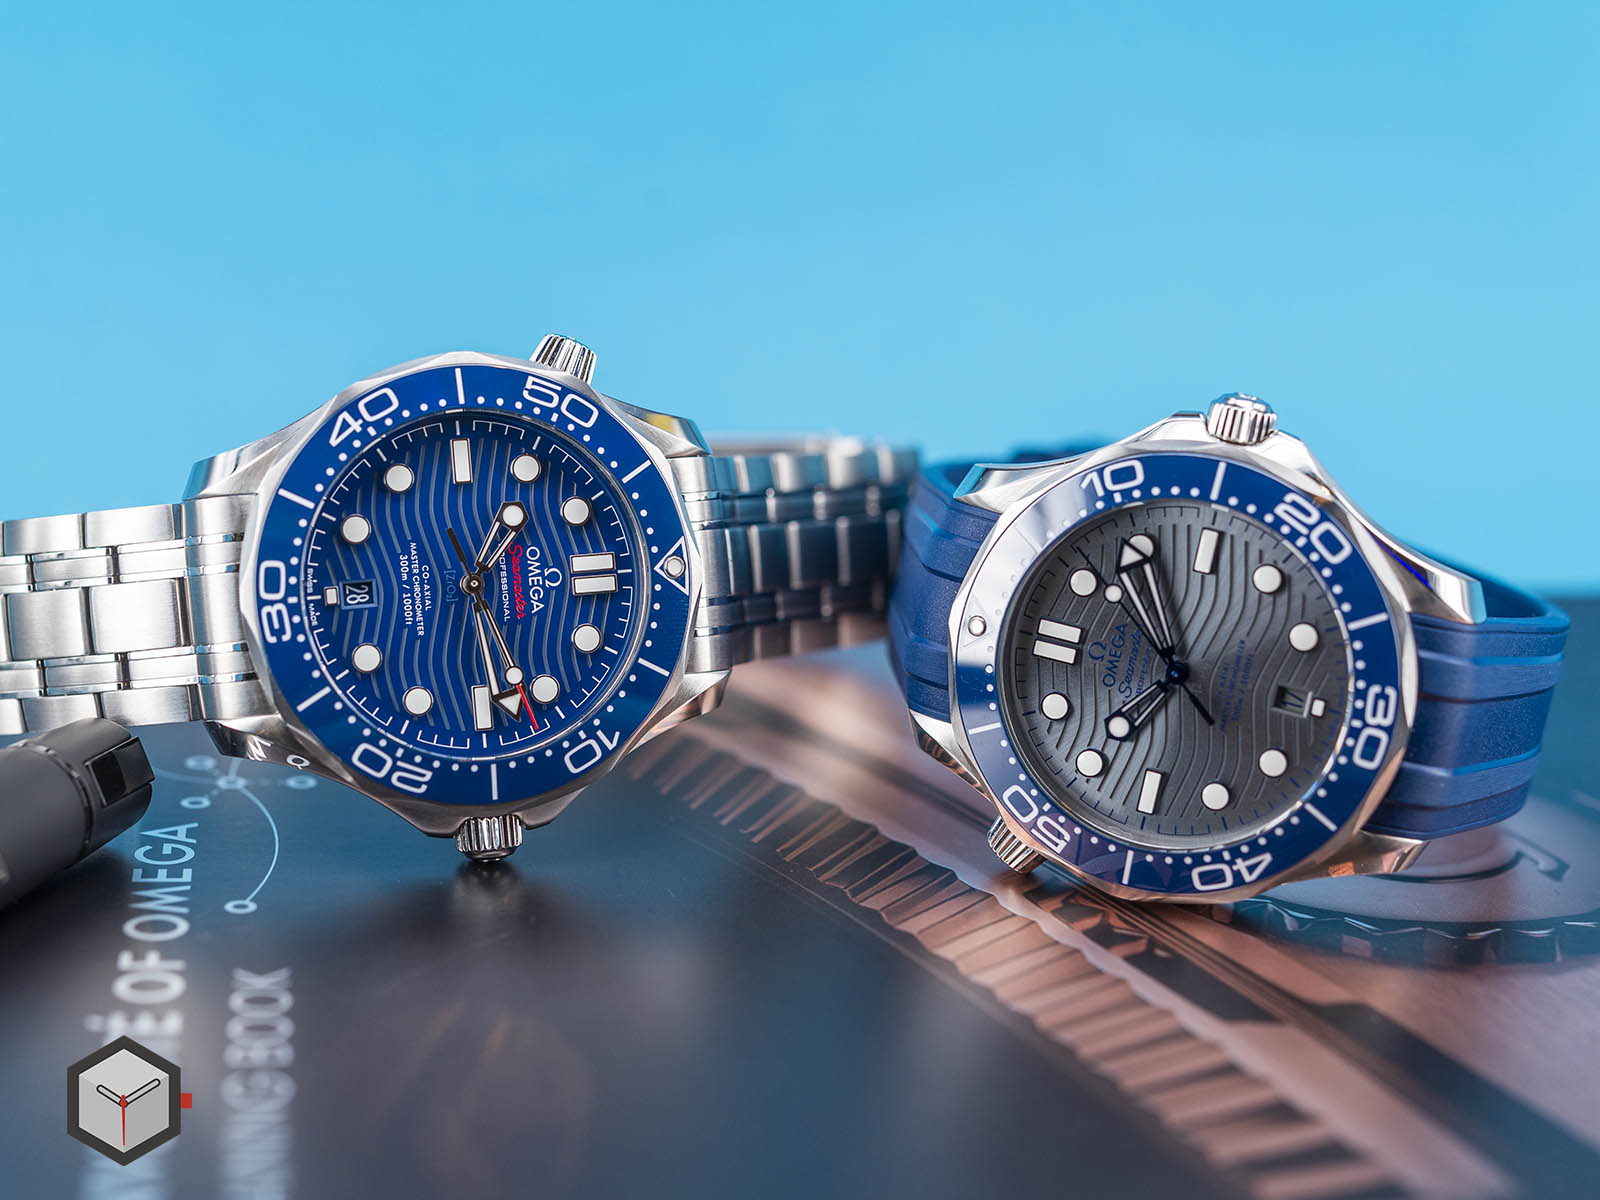 210-30-42-20-03-001-omega-seamaster-professional-diver-300m-12.jpg